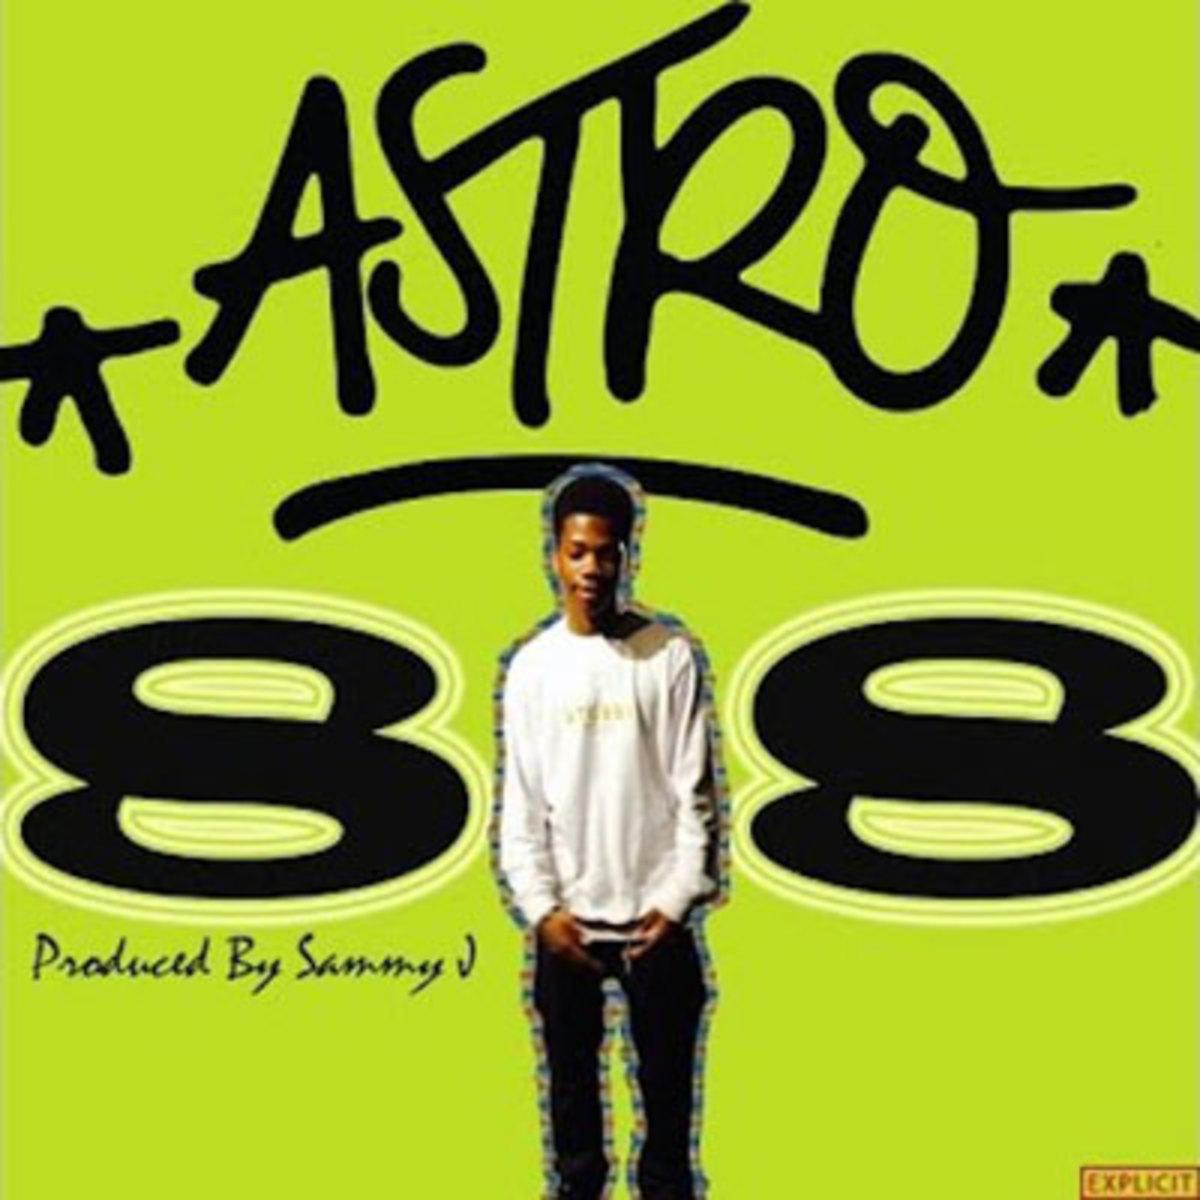 astro-88.jpg